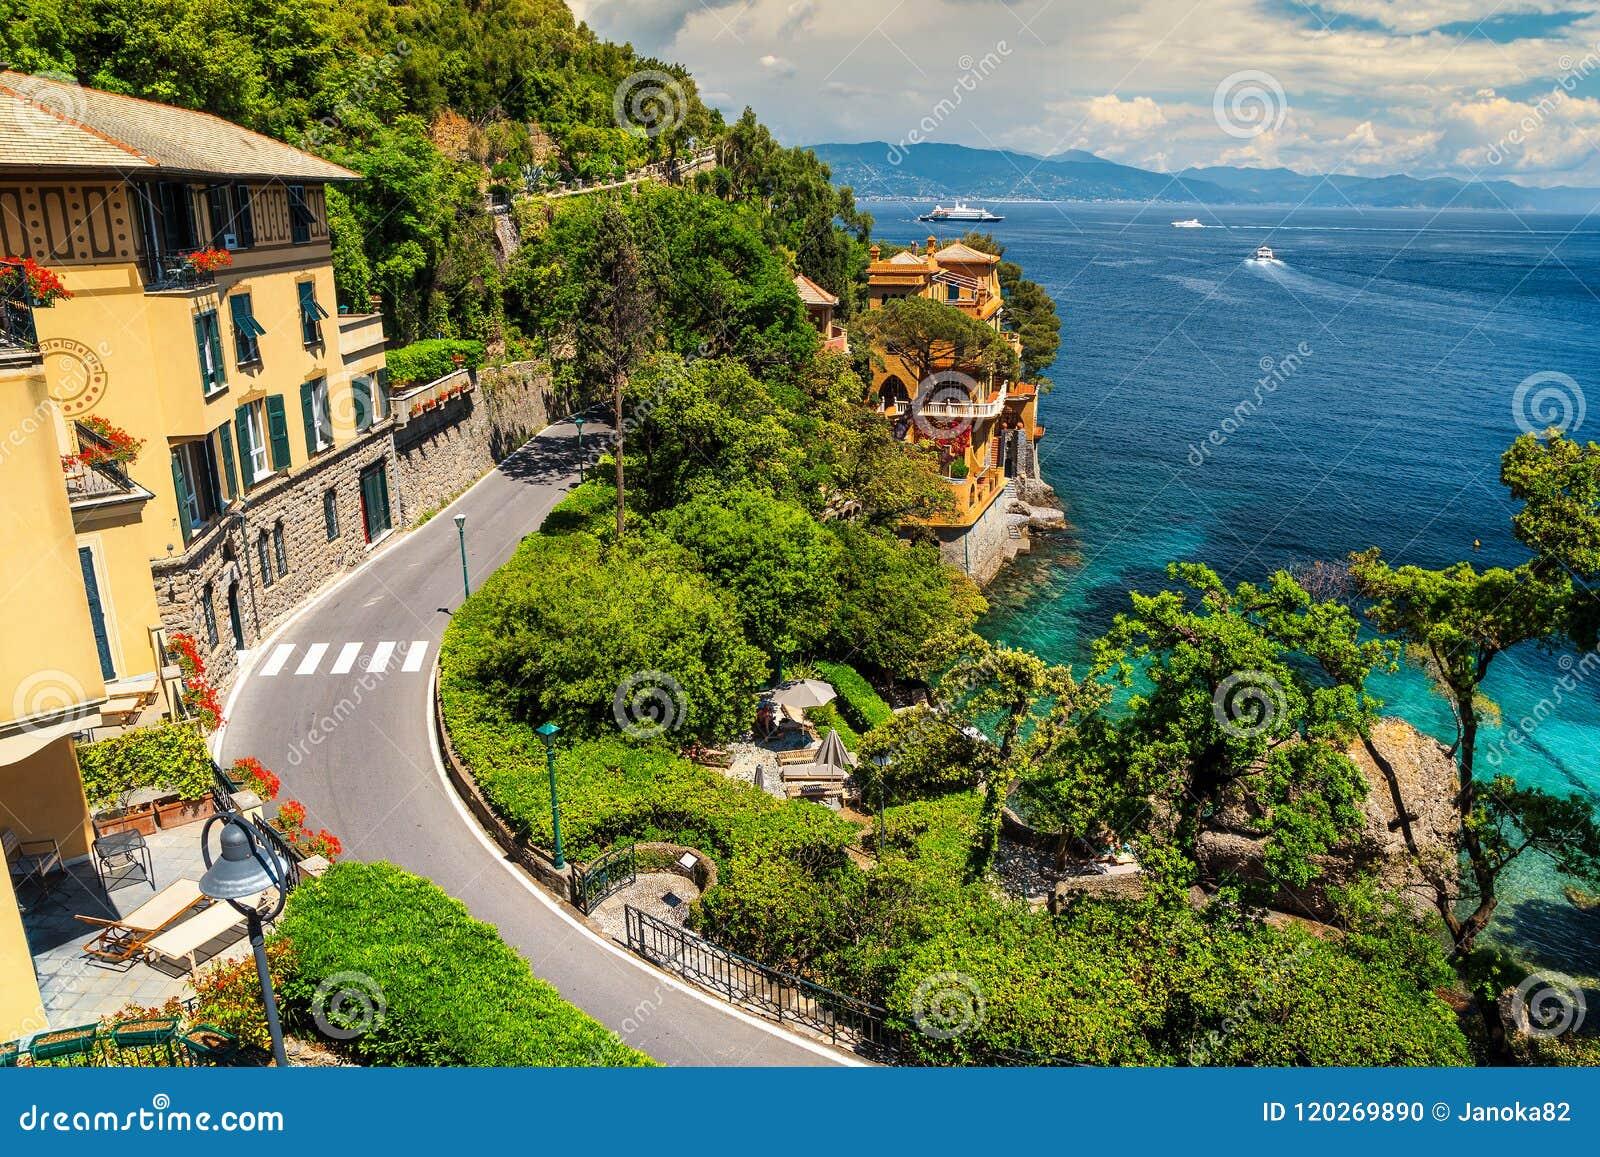 Amazing Luxury Homes Near Portofino Resort, Liguria, Italy, Europe